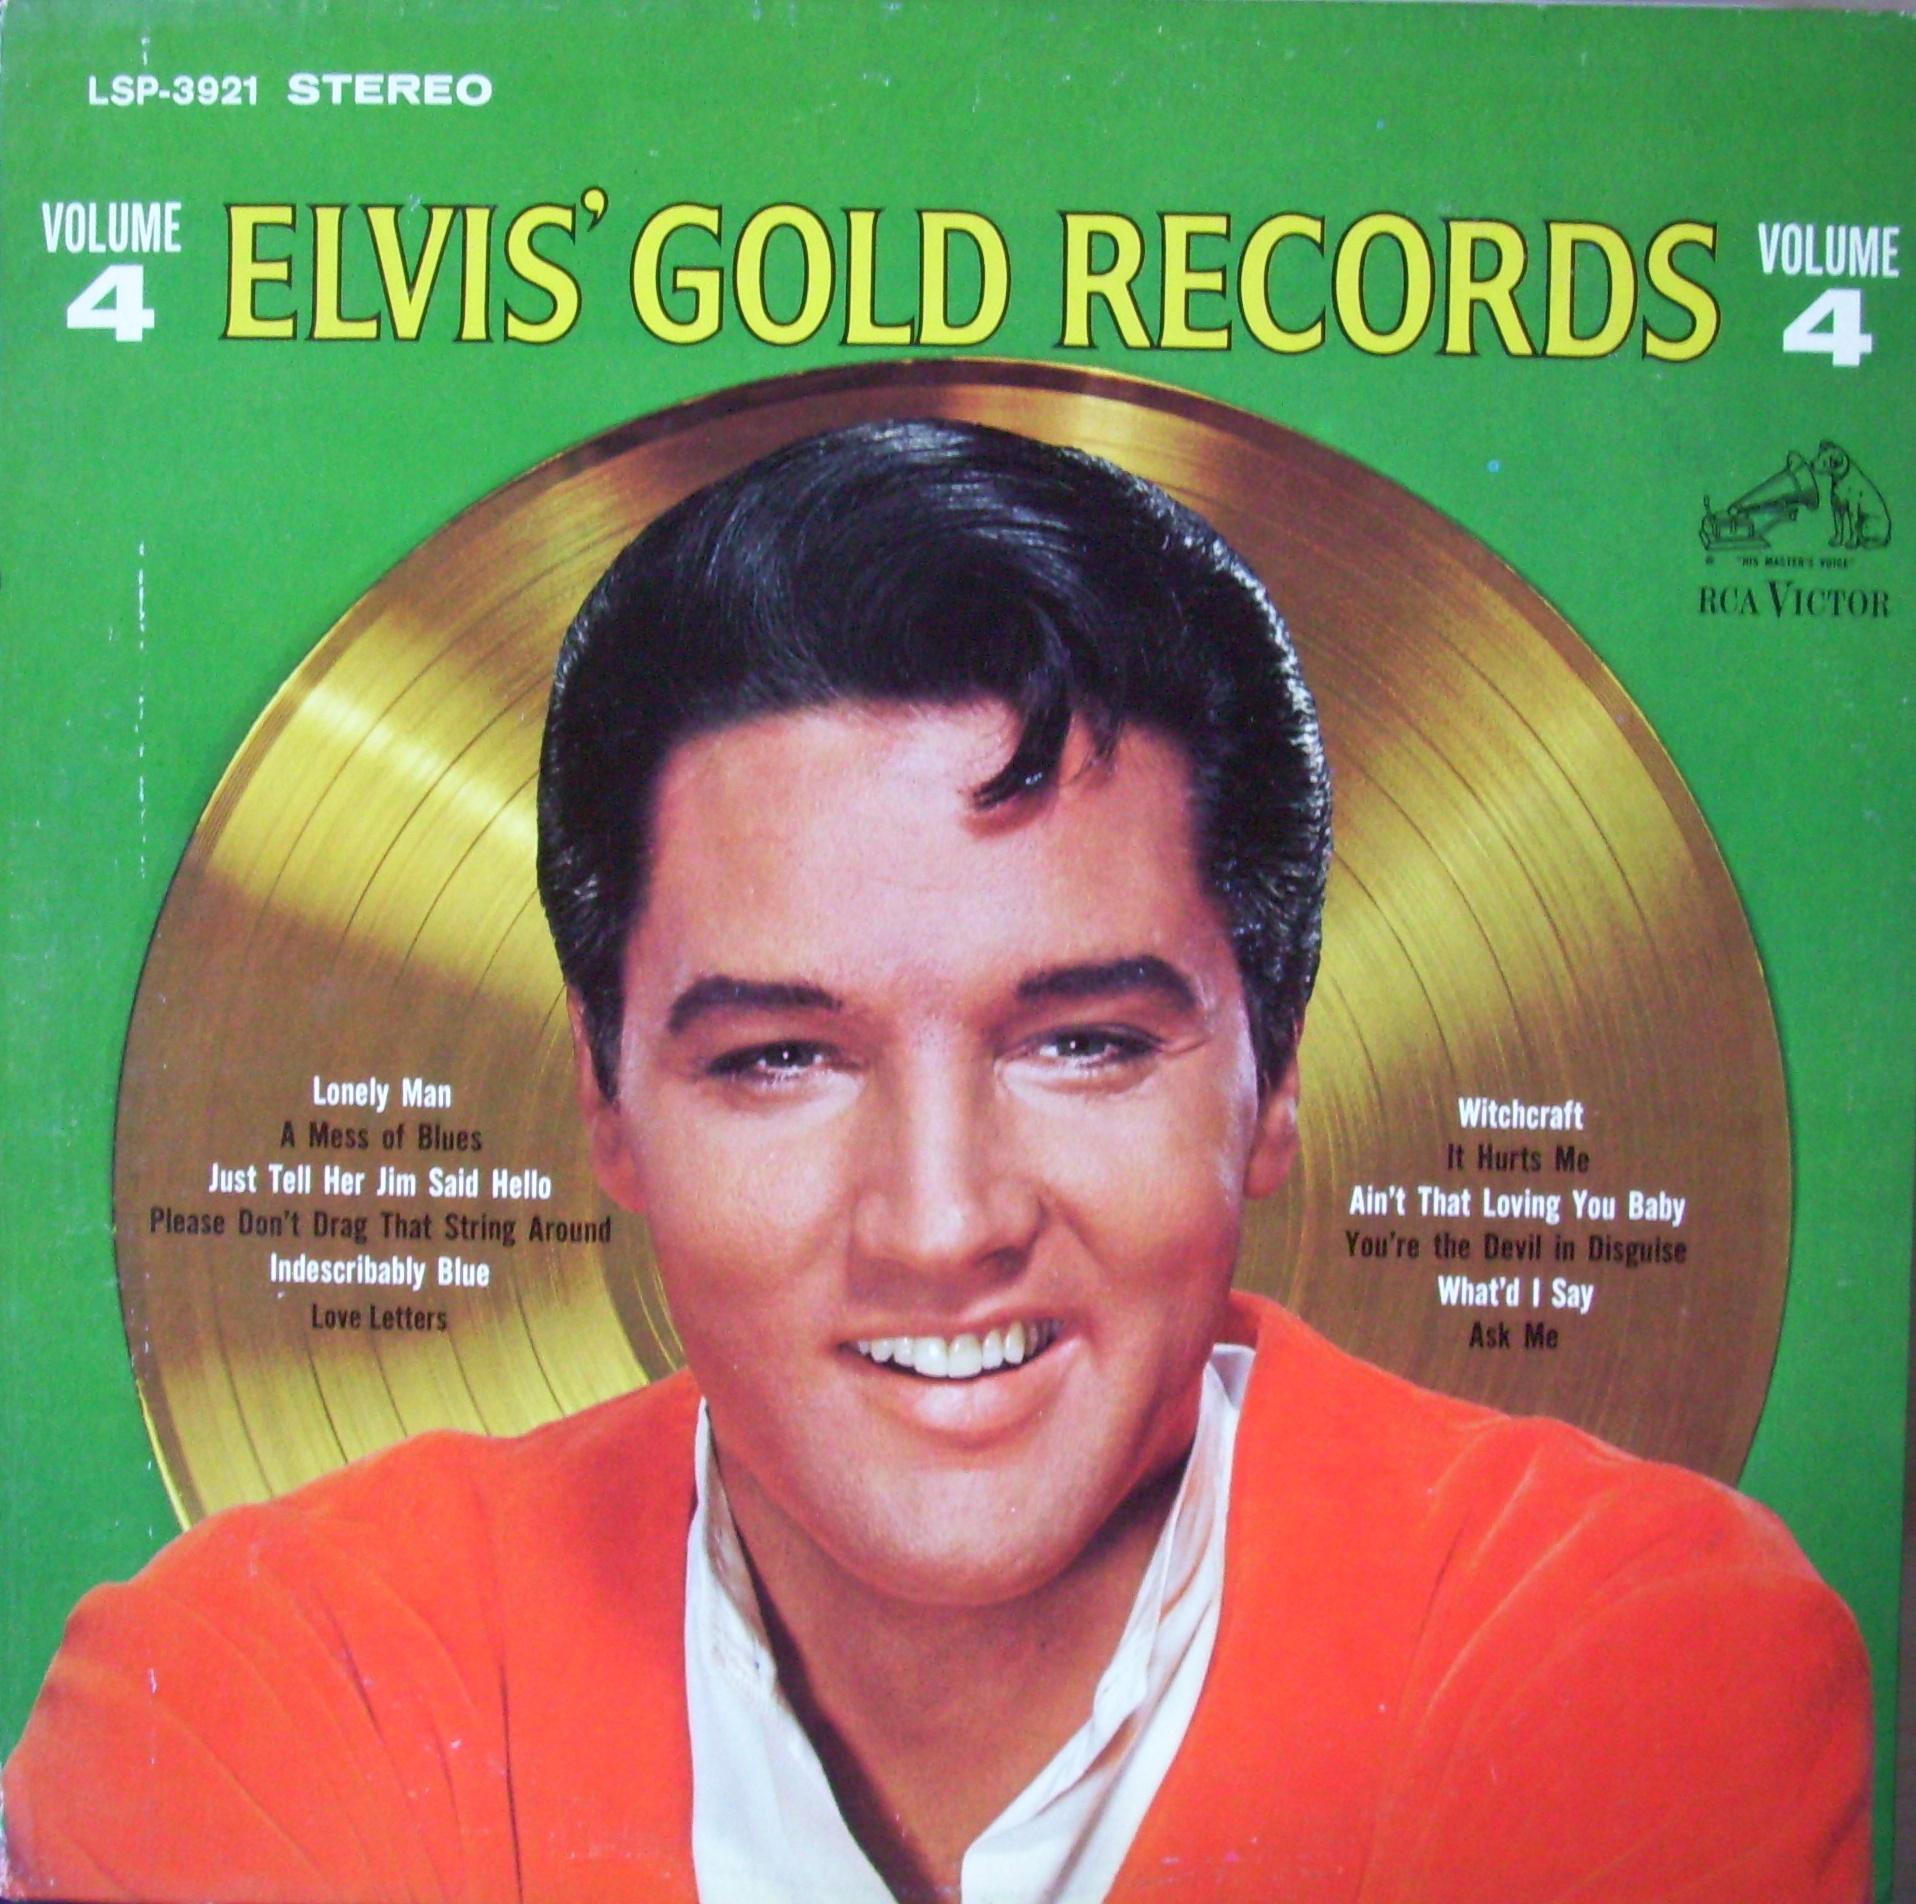 ELVIS' GOLD RECORDS VOL 4 Dwkksyol